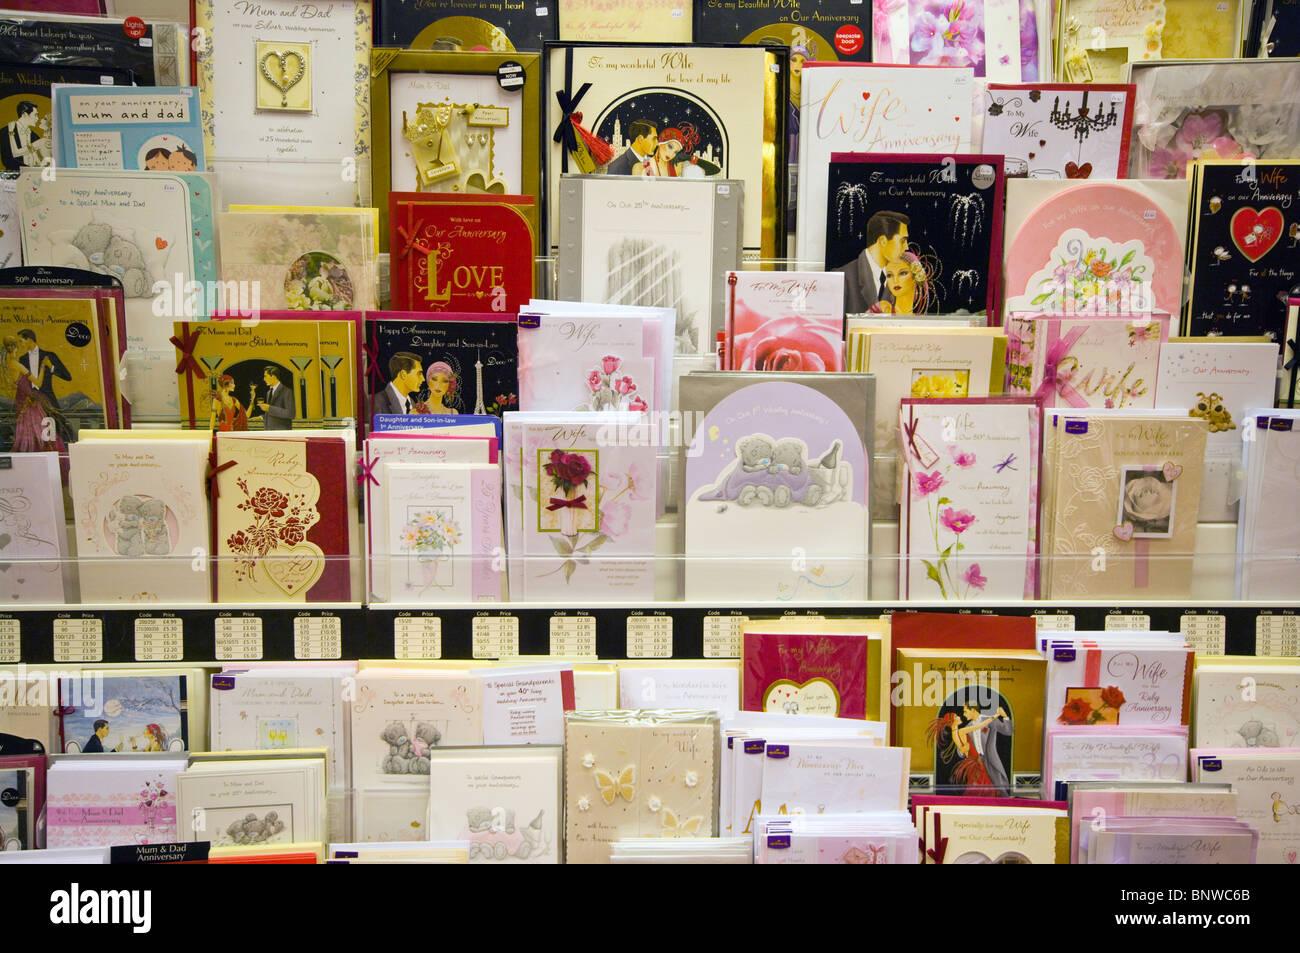 Greetings Cards Display Stock Photo 30676531 Alamy